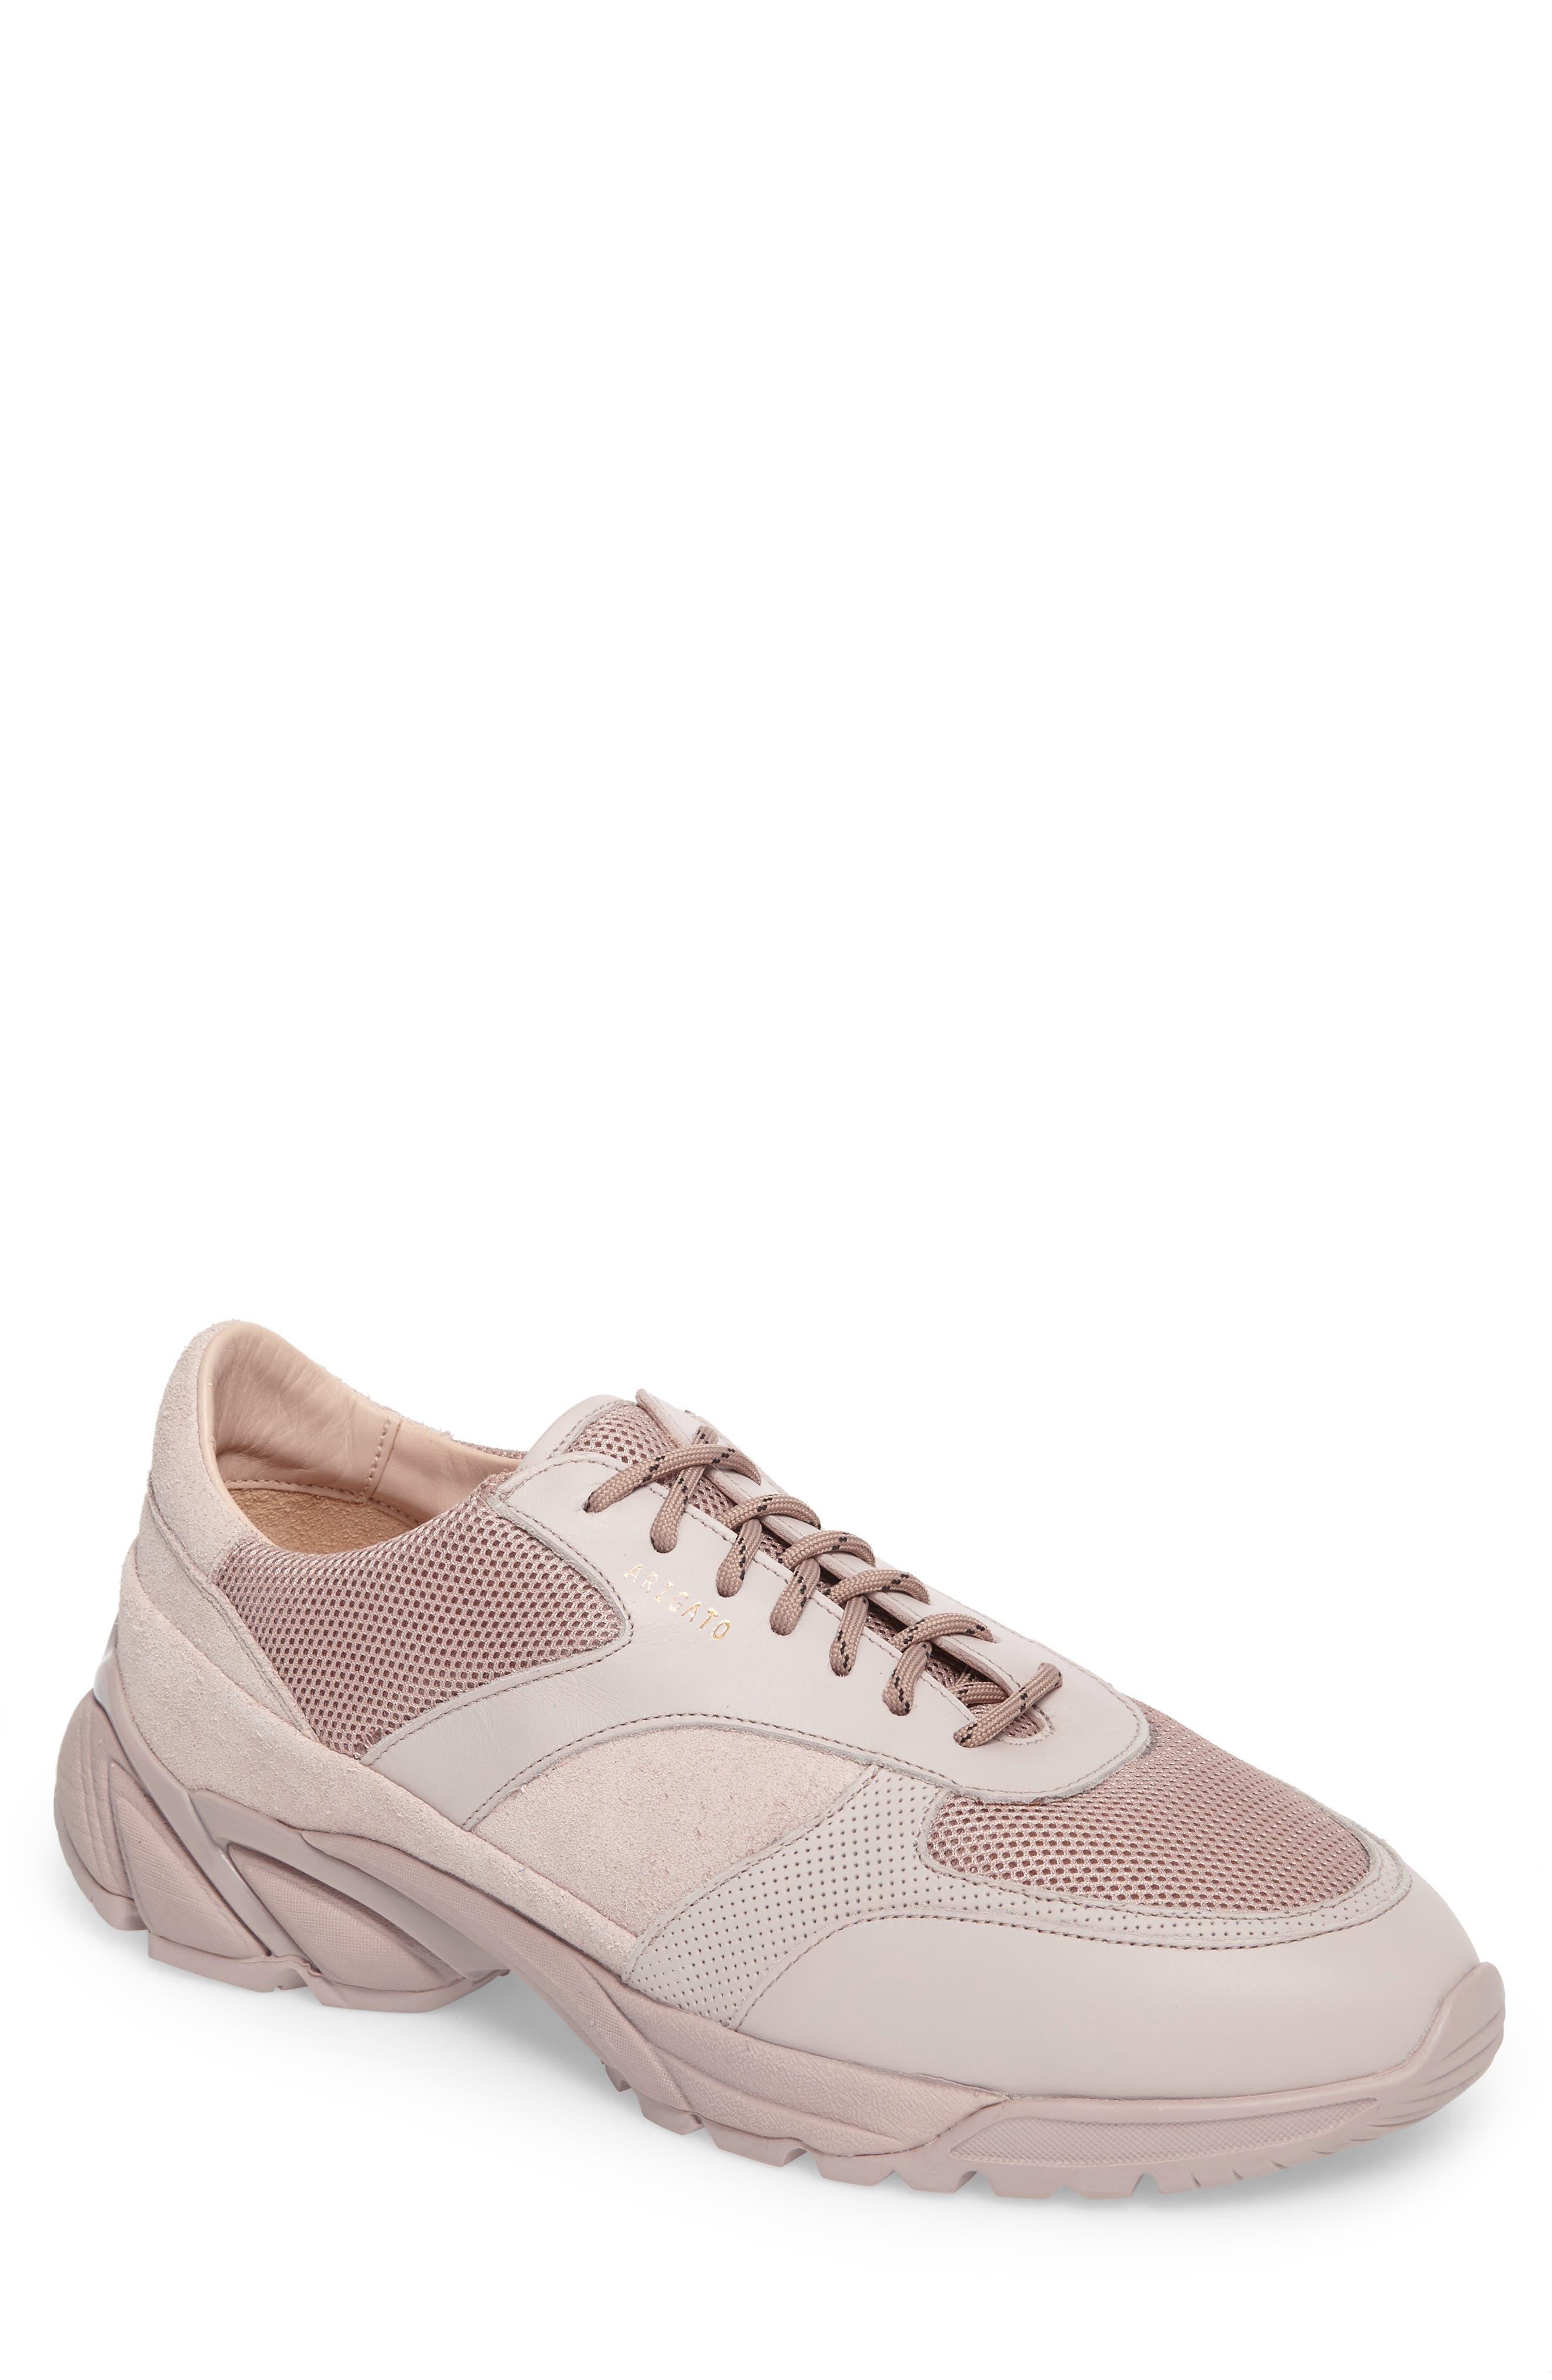 Tech Sneaker,                         Main,                         color, 650